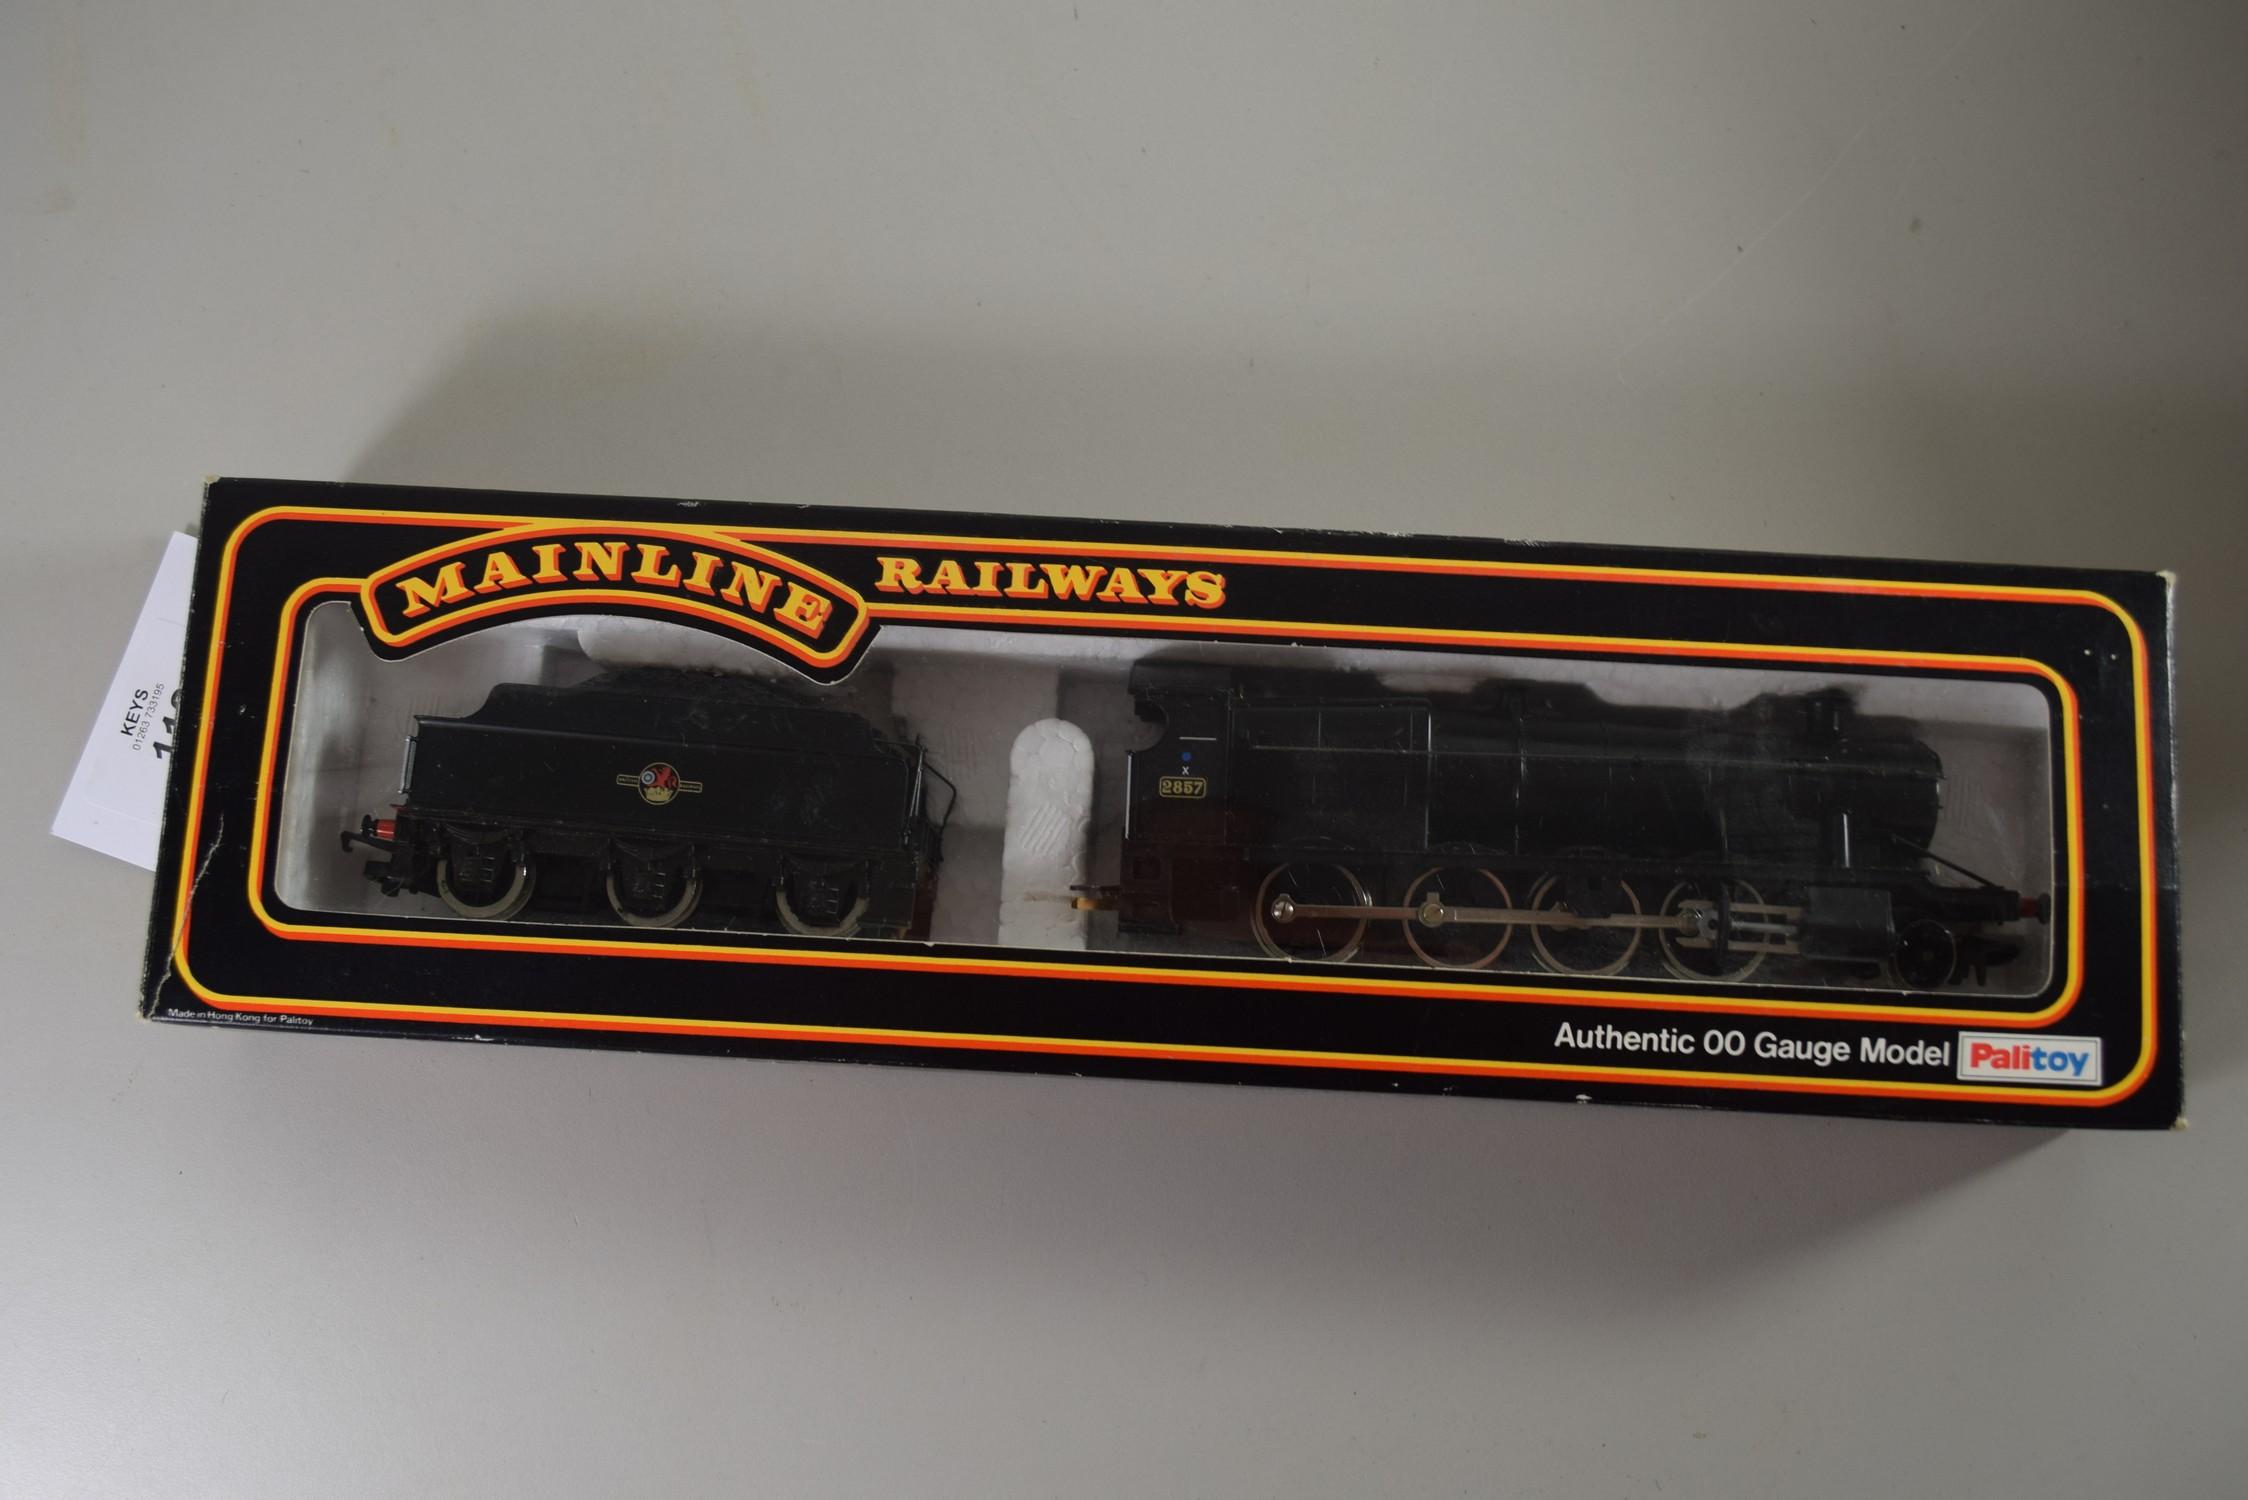 Hornby locomotive No 2857 in un-associated box